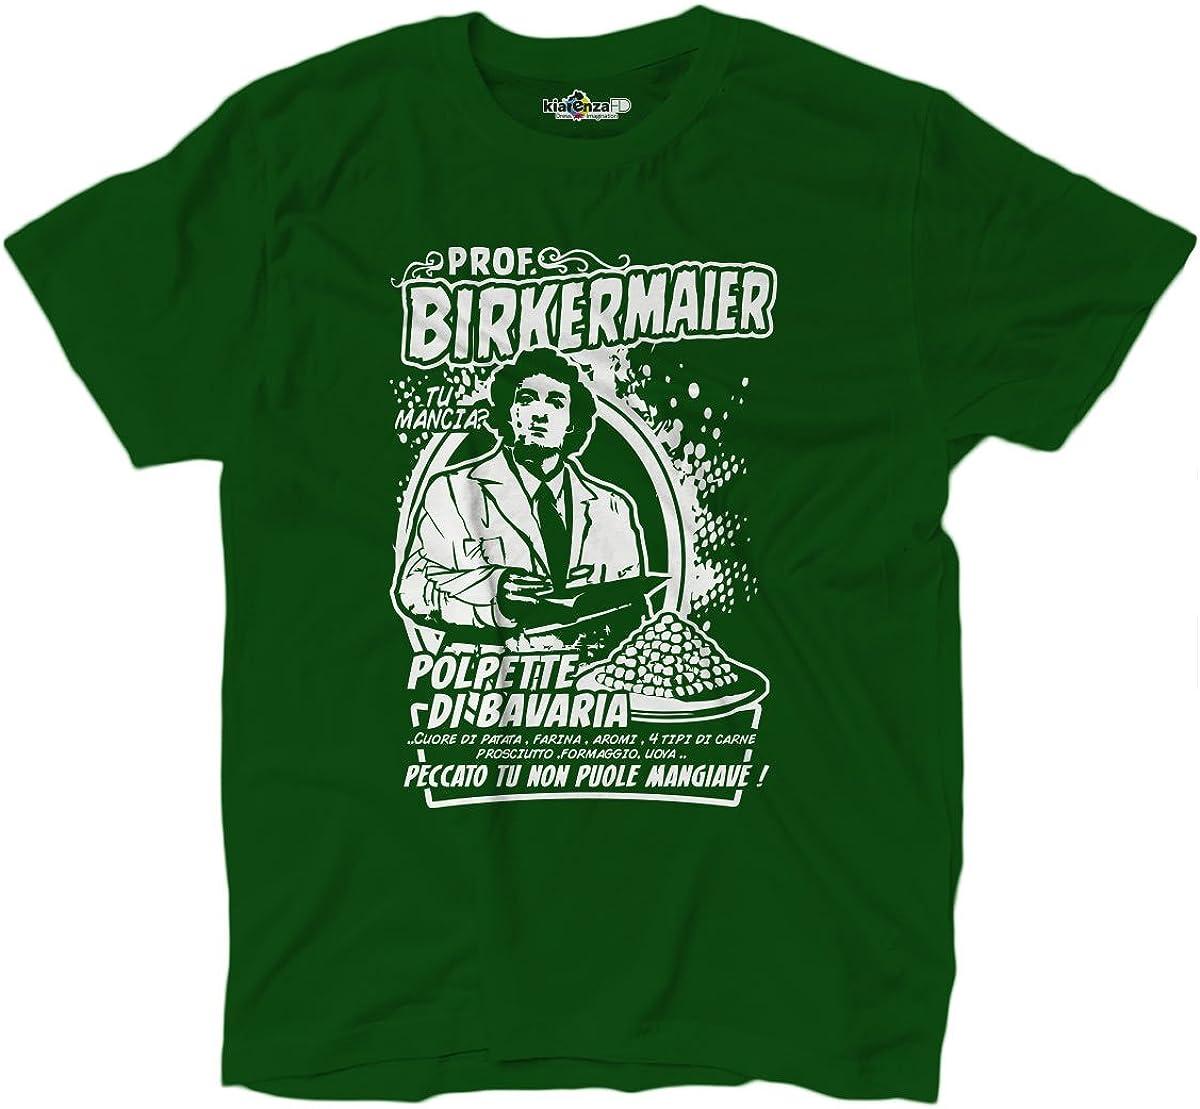 T-Shirt Uomo Film Trash Anni 80 Birkermaier Polpette Di Bavaria Tu Mancia Verde